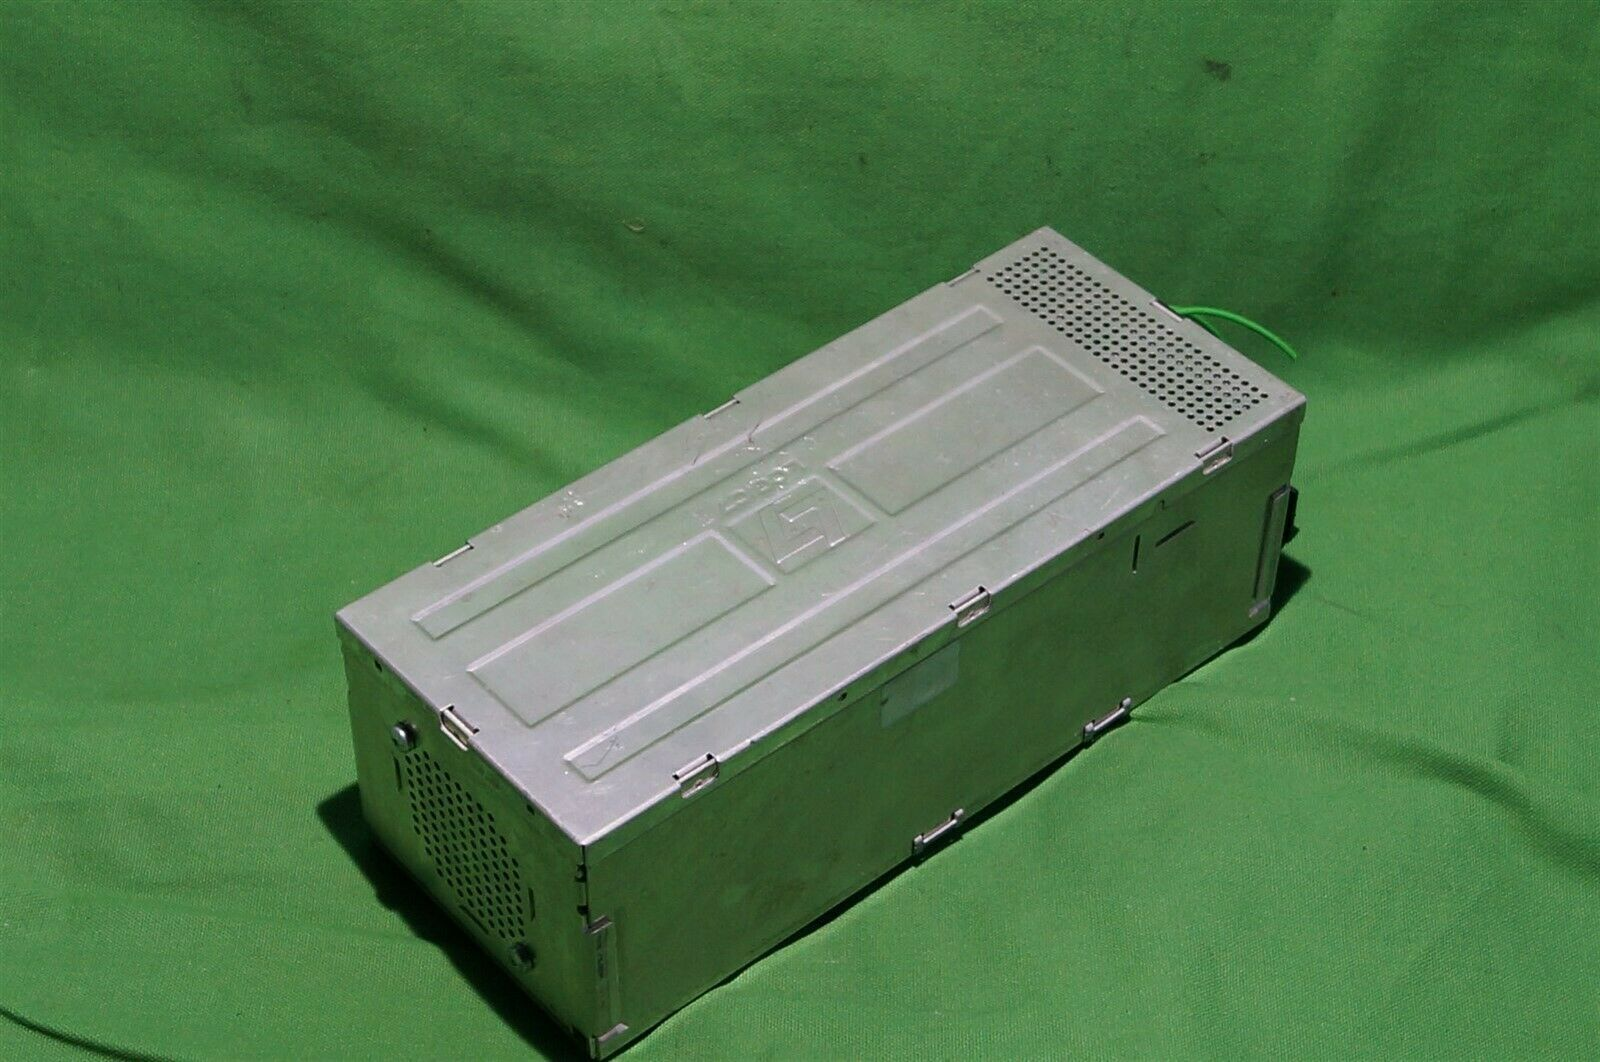 BMW Top Hifi DSP Logic 7 Amplifier Amp 65.12-6 961 389 Herman Becker